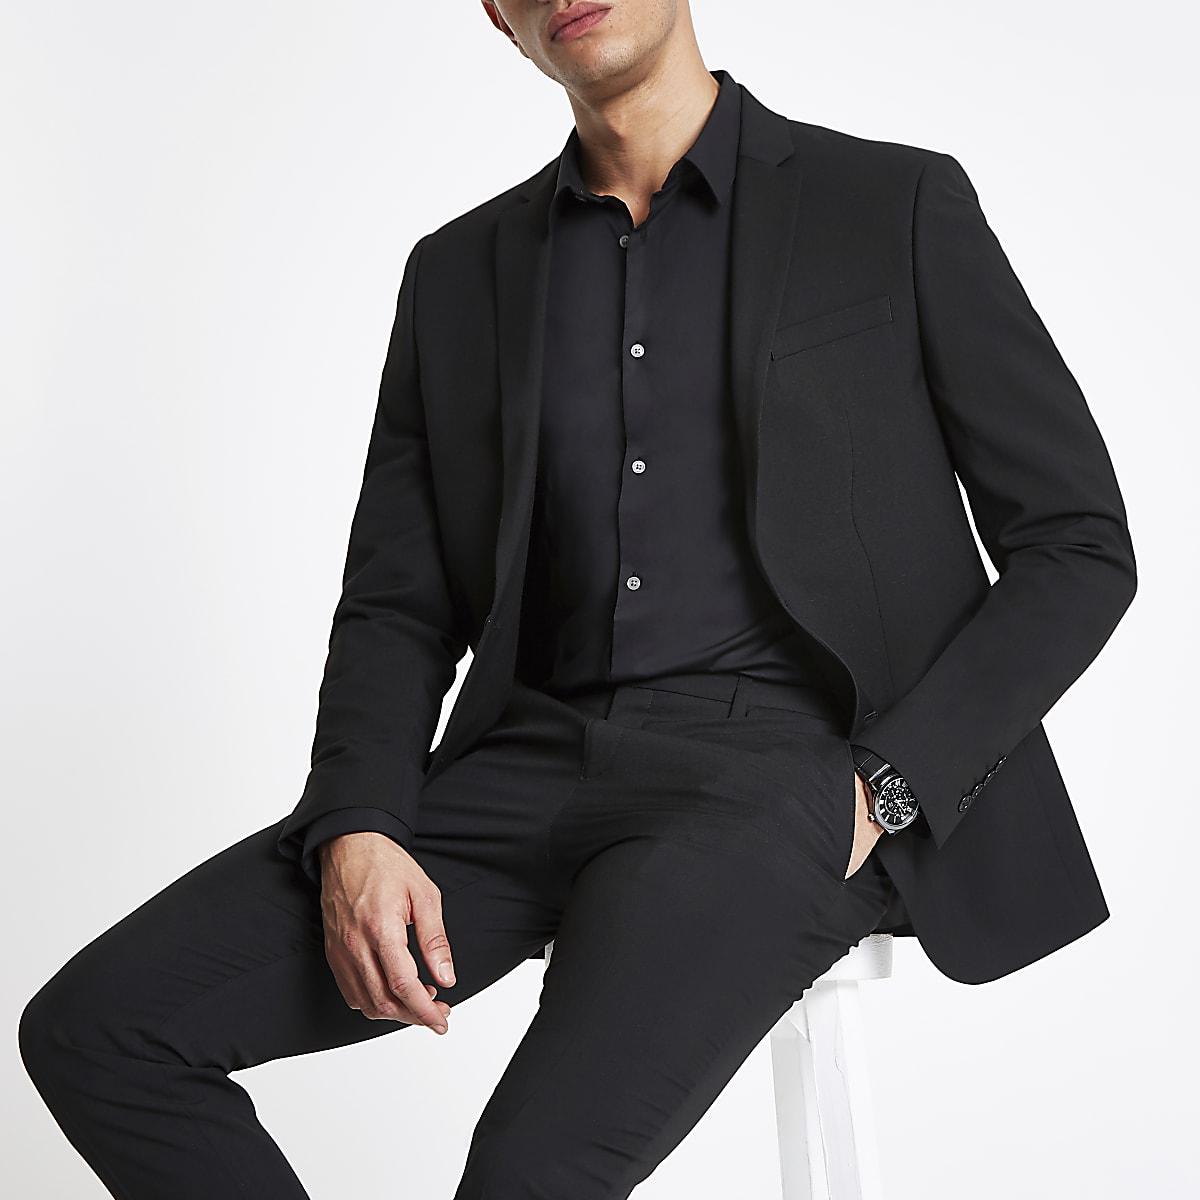 Black stretch skinny fit suit jacket